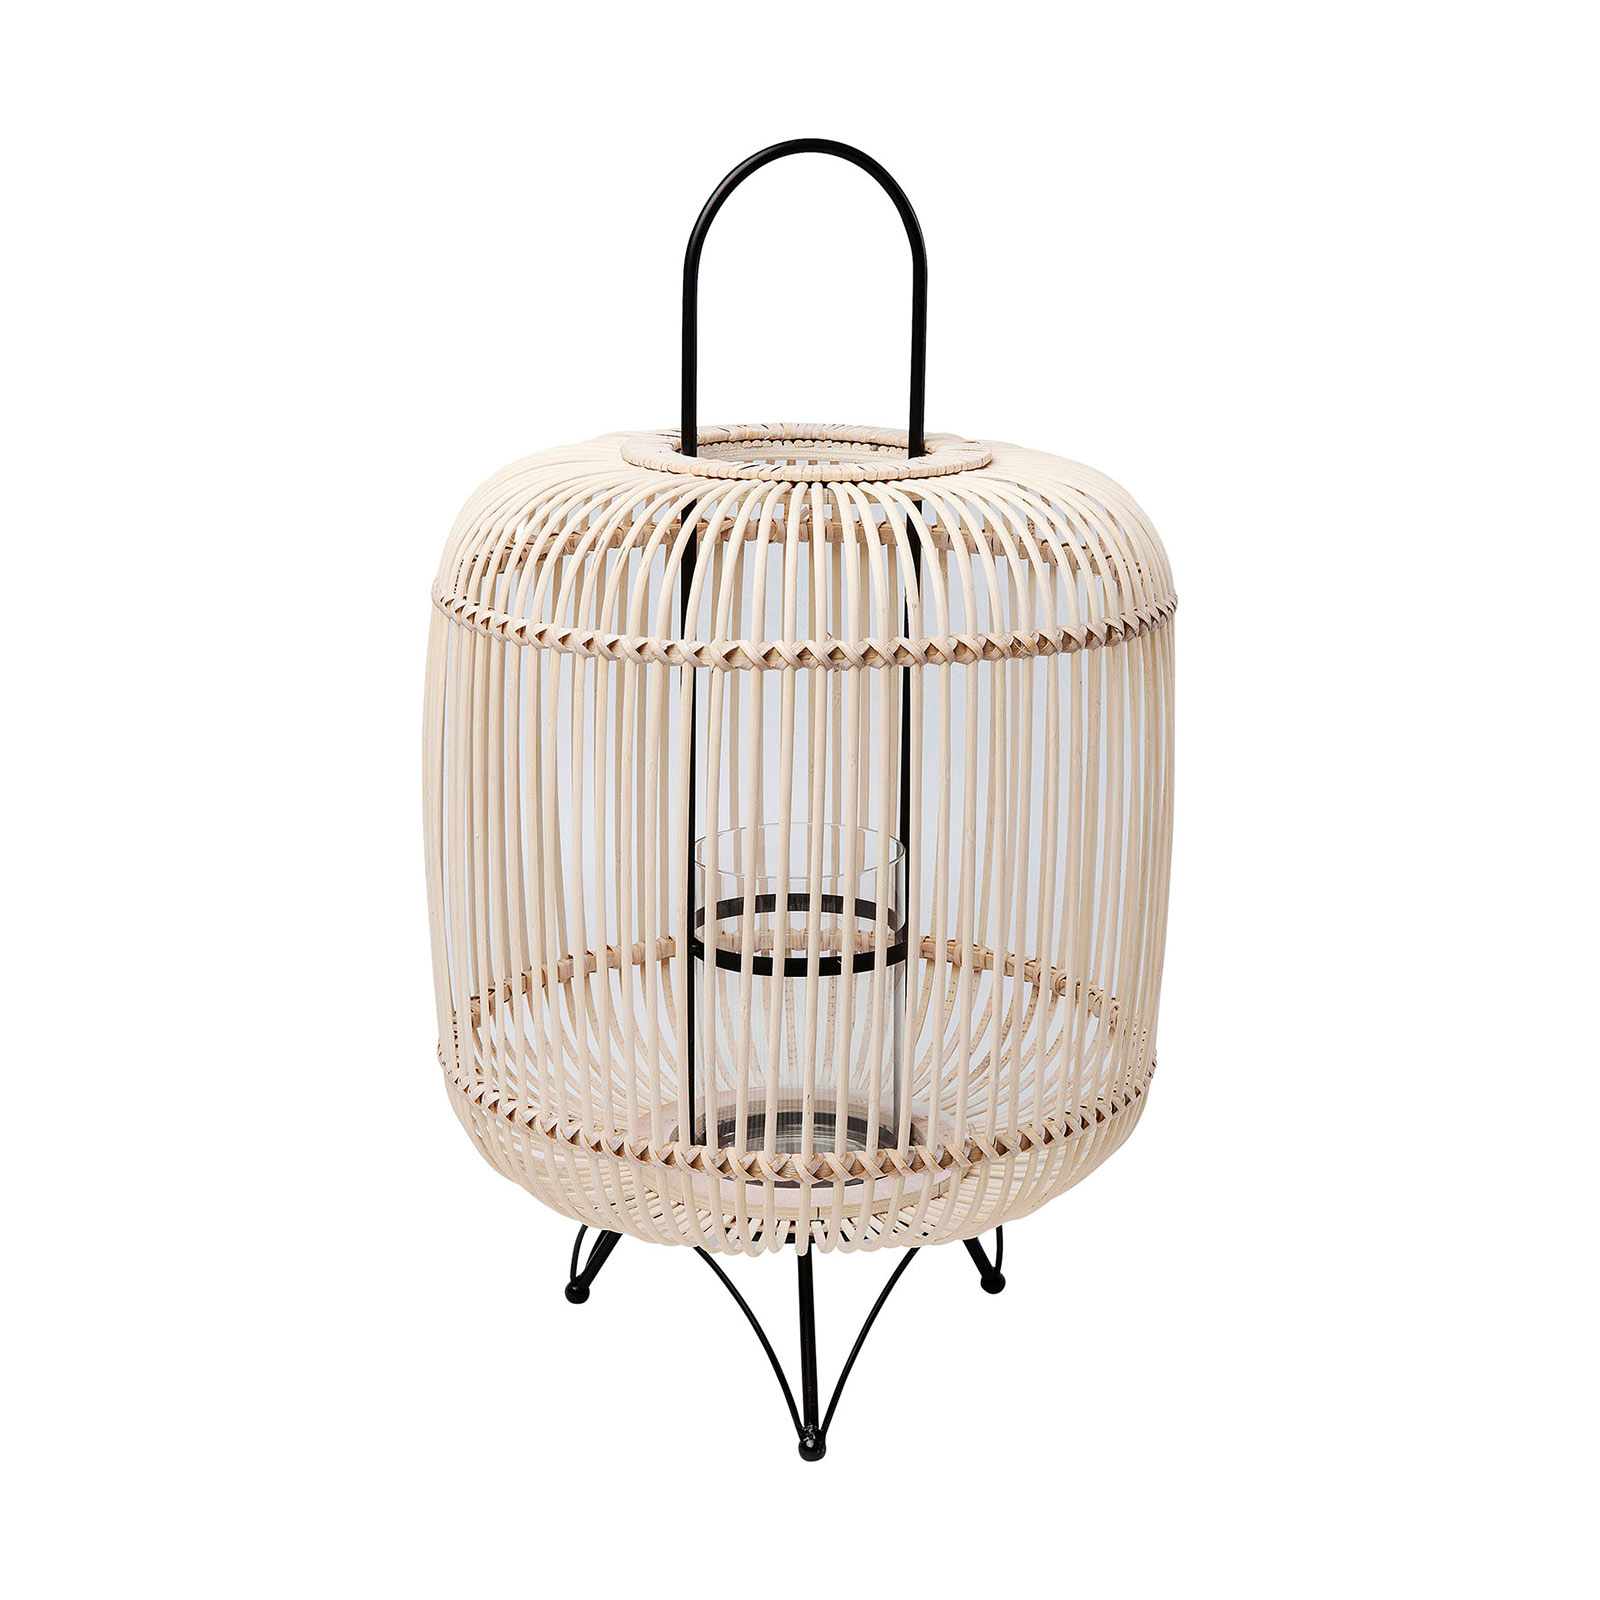 KARE Bamboo lampa stołowa 62 cm